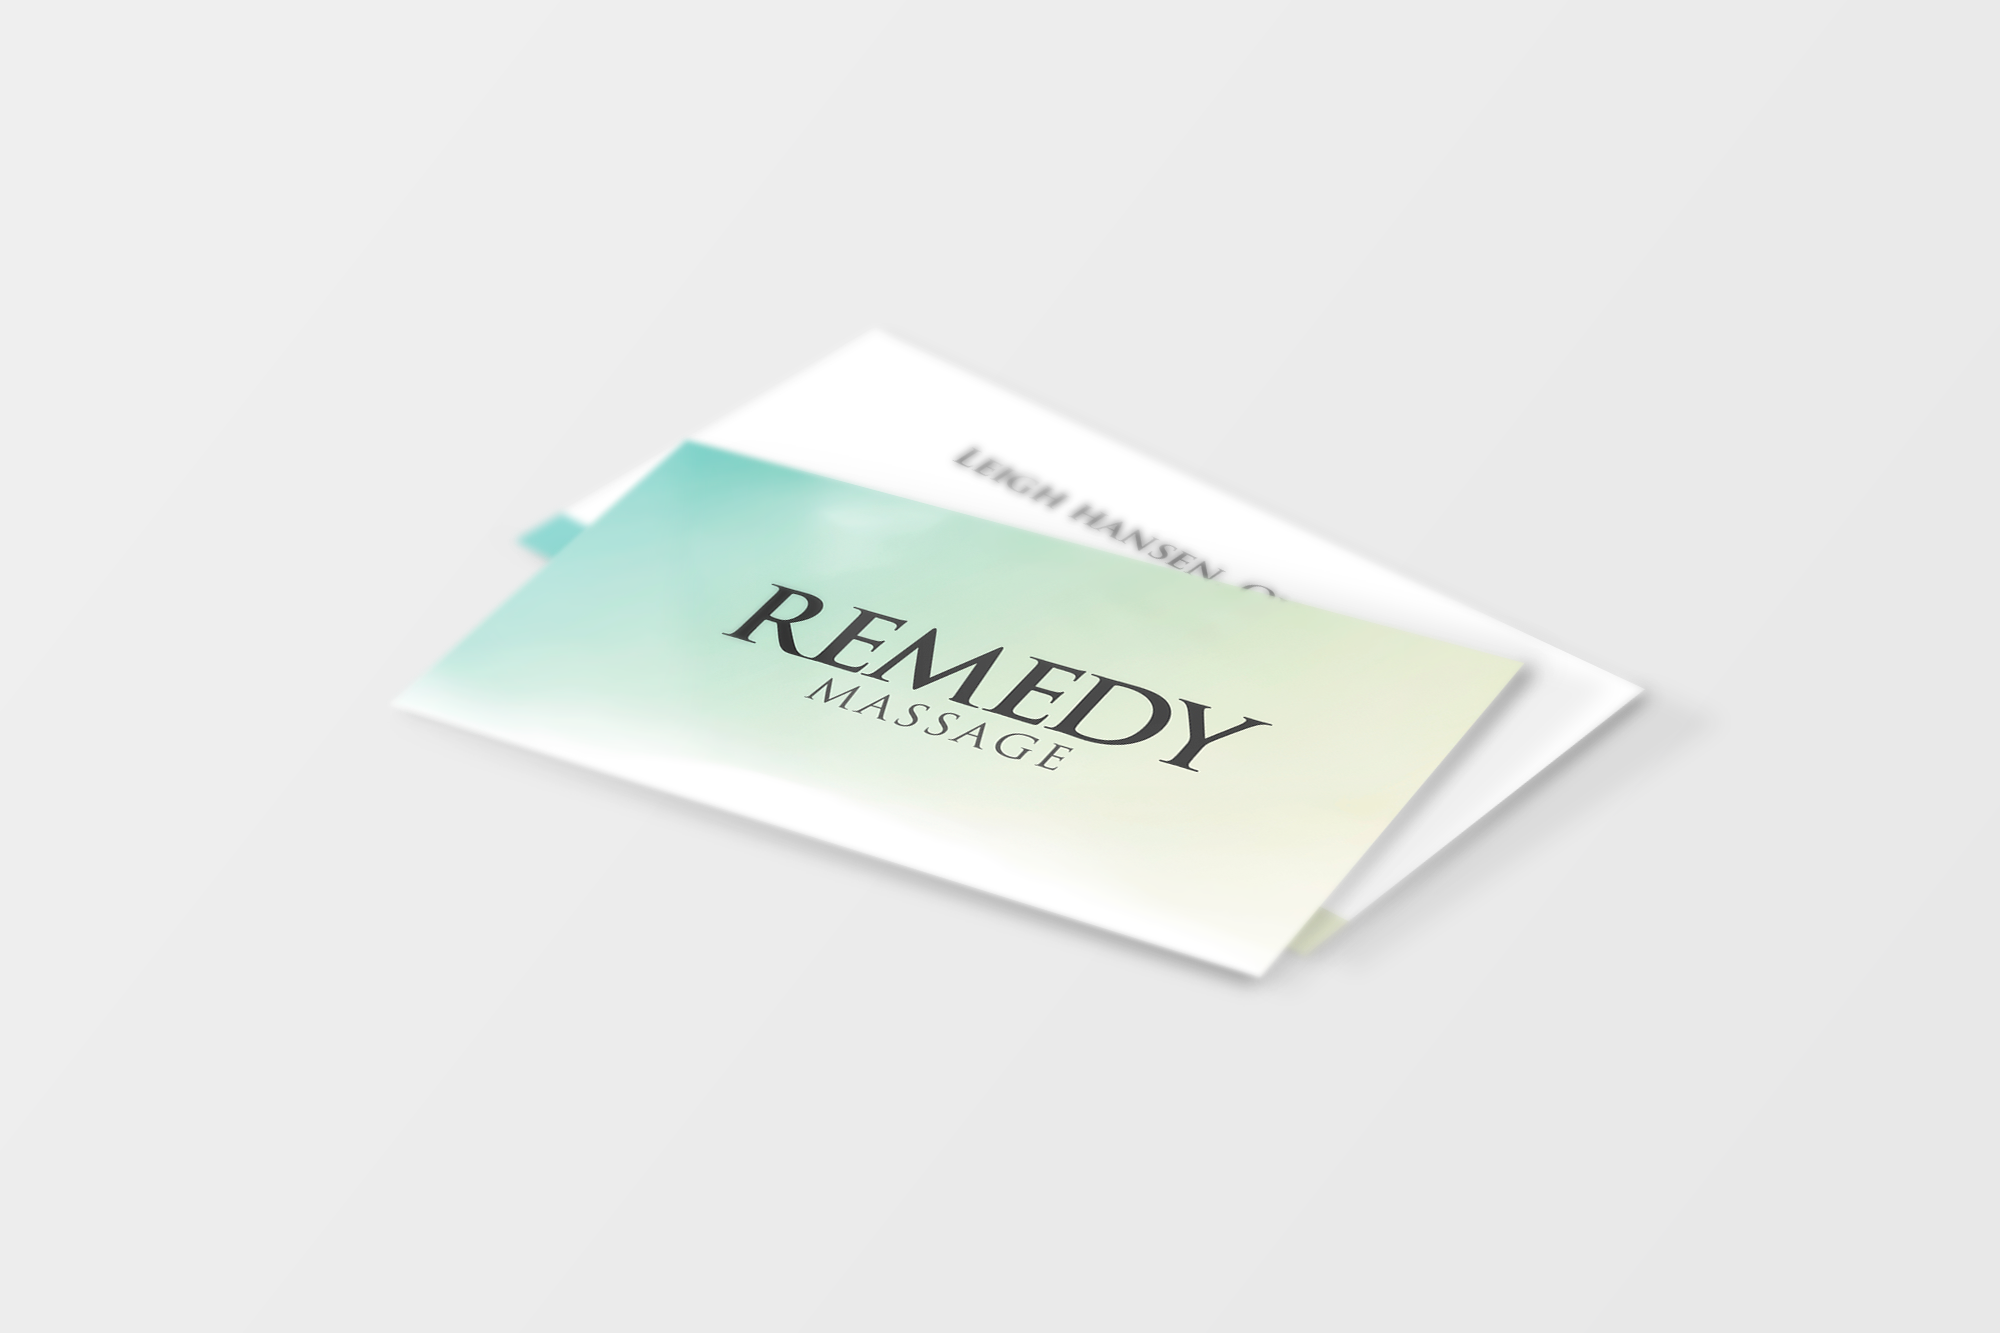 remedybiz2